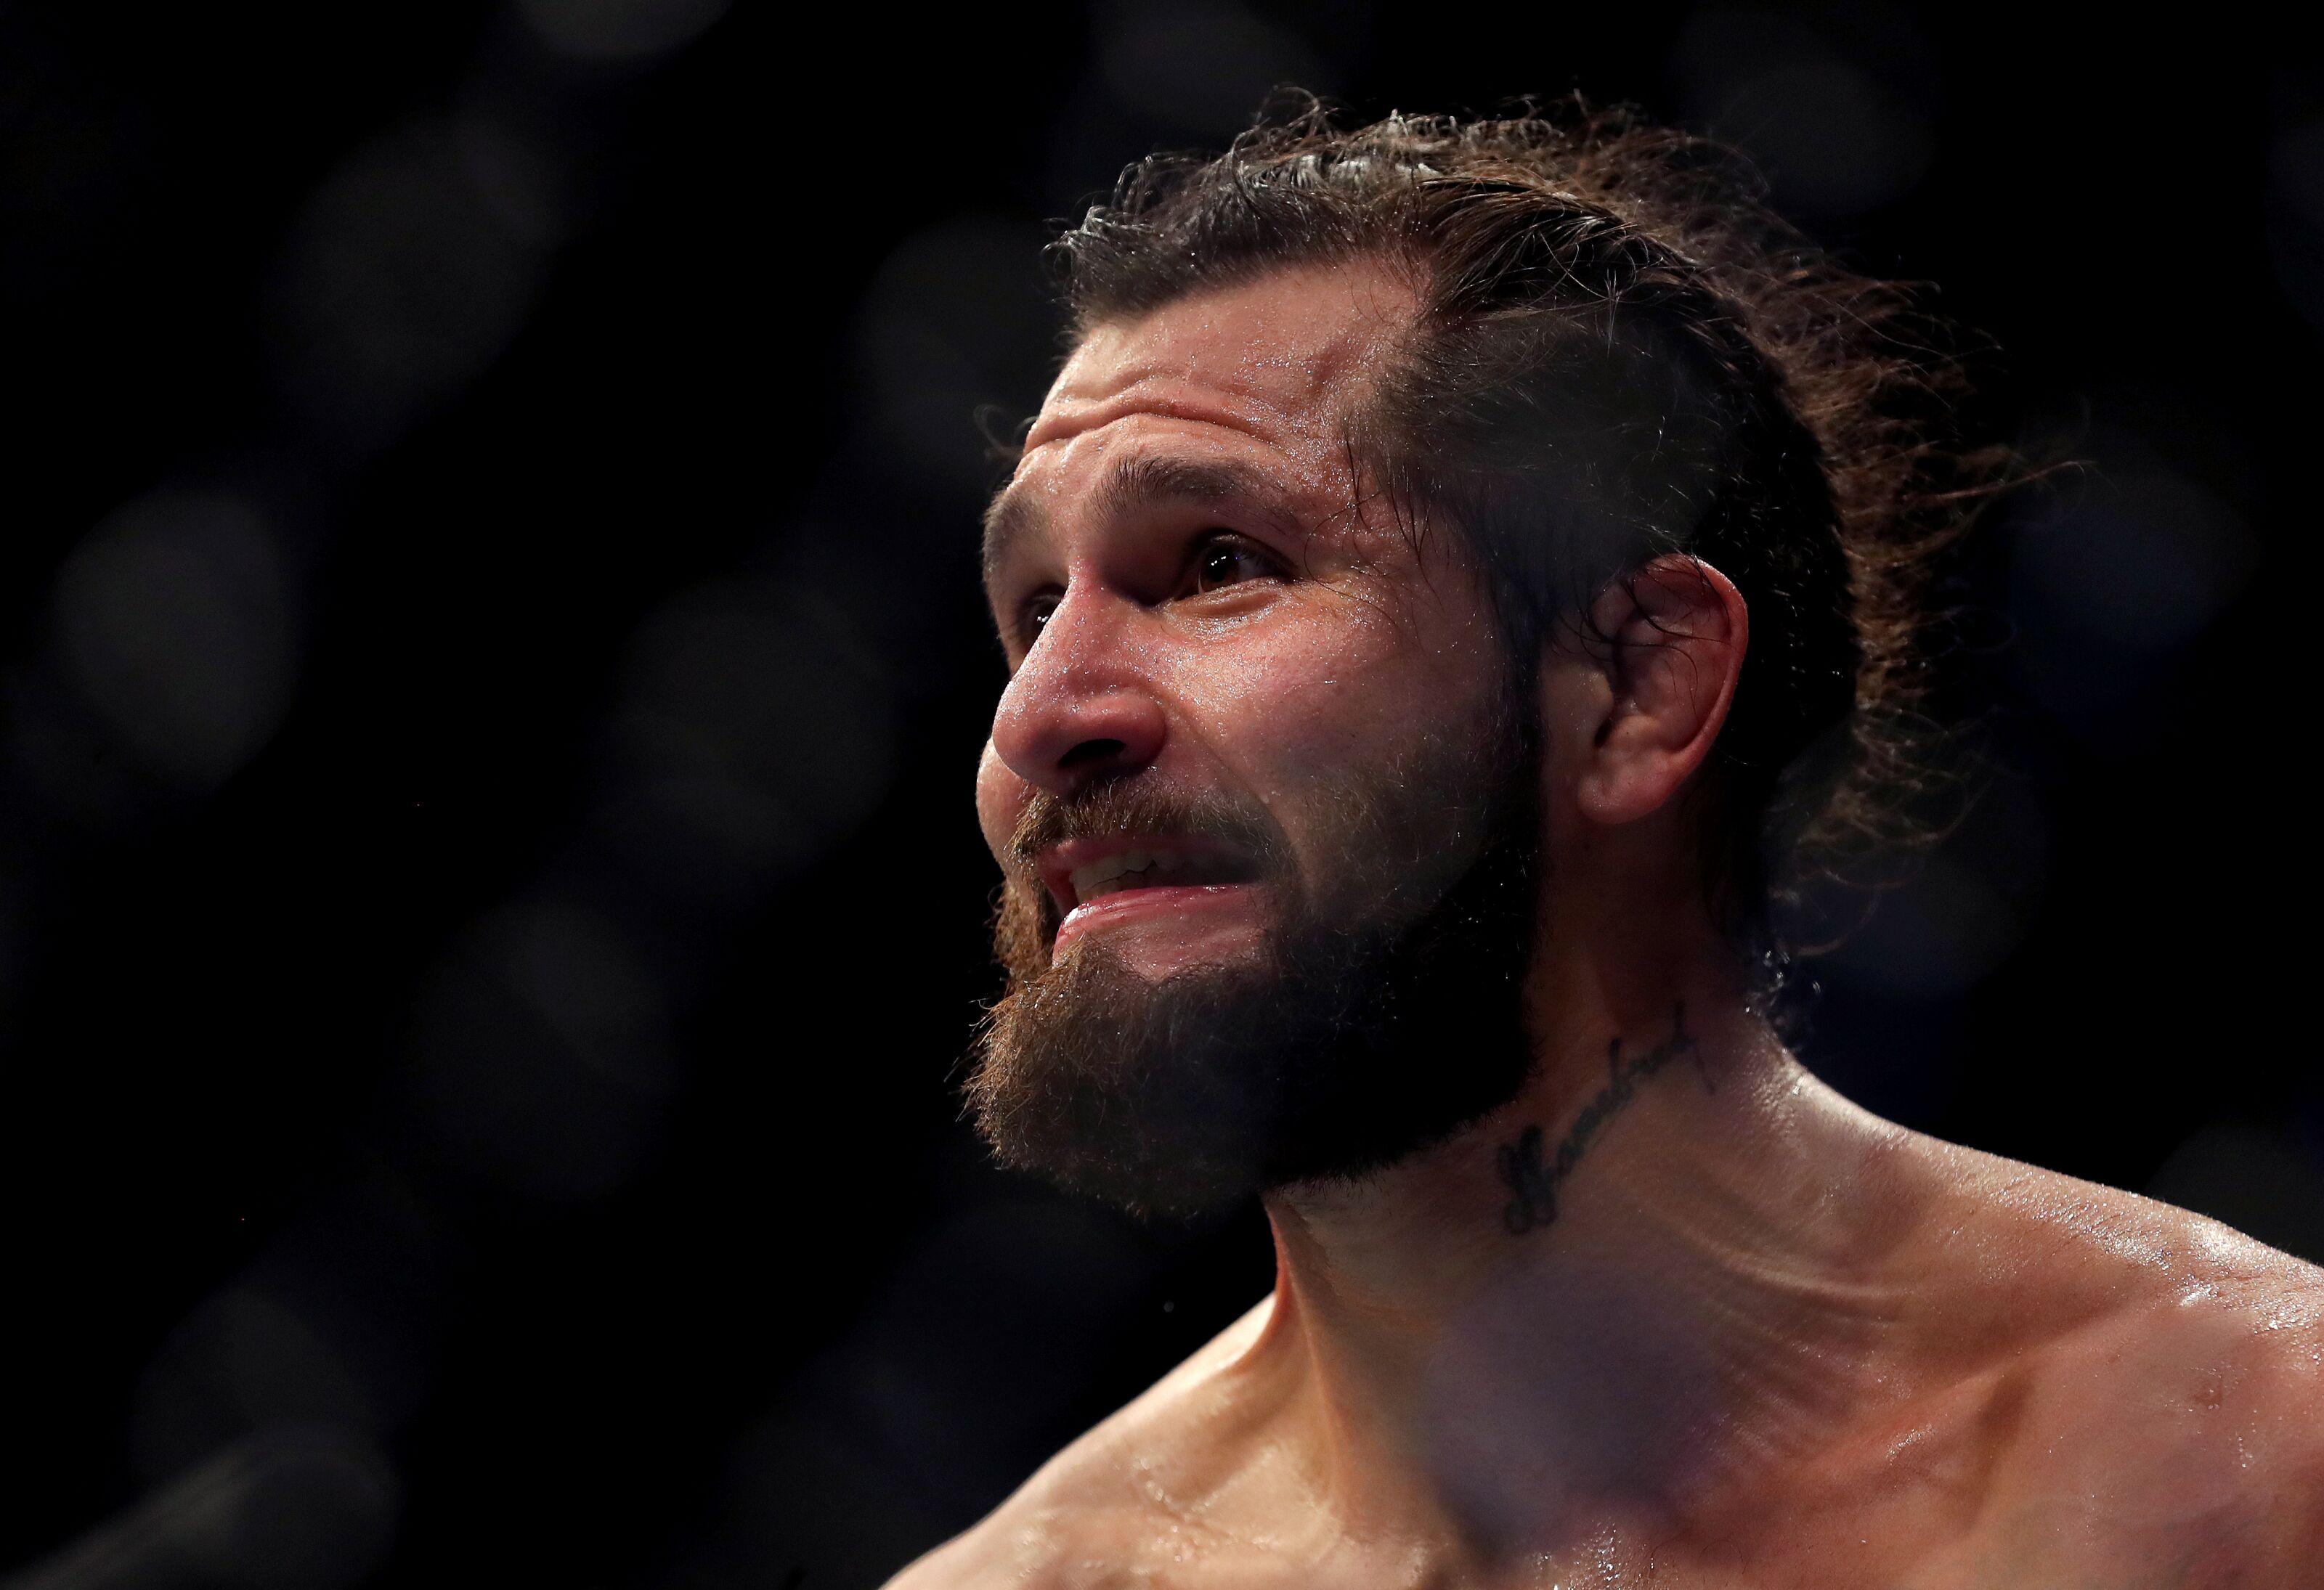 Jorge Masvidal, Leon Edwards exchange blows backstage at UFC London (VIDEO)